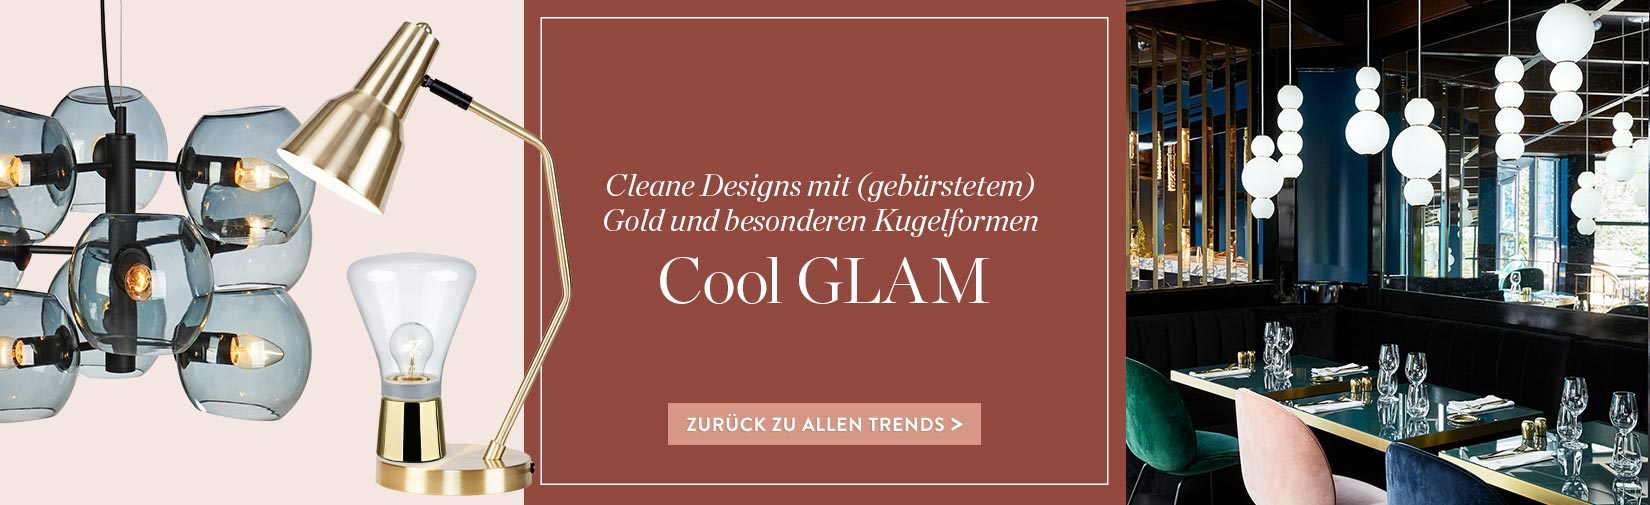 LP_Leuchten_CoolGlam_Desktop_new